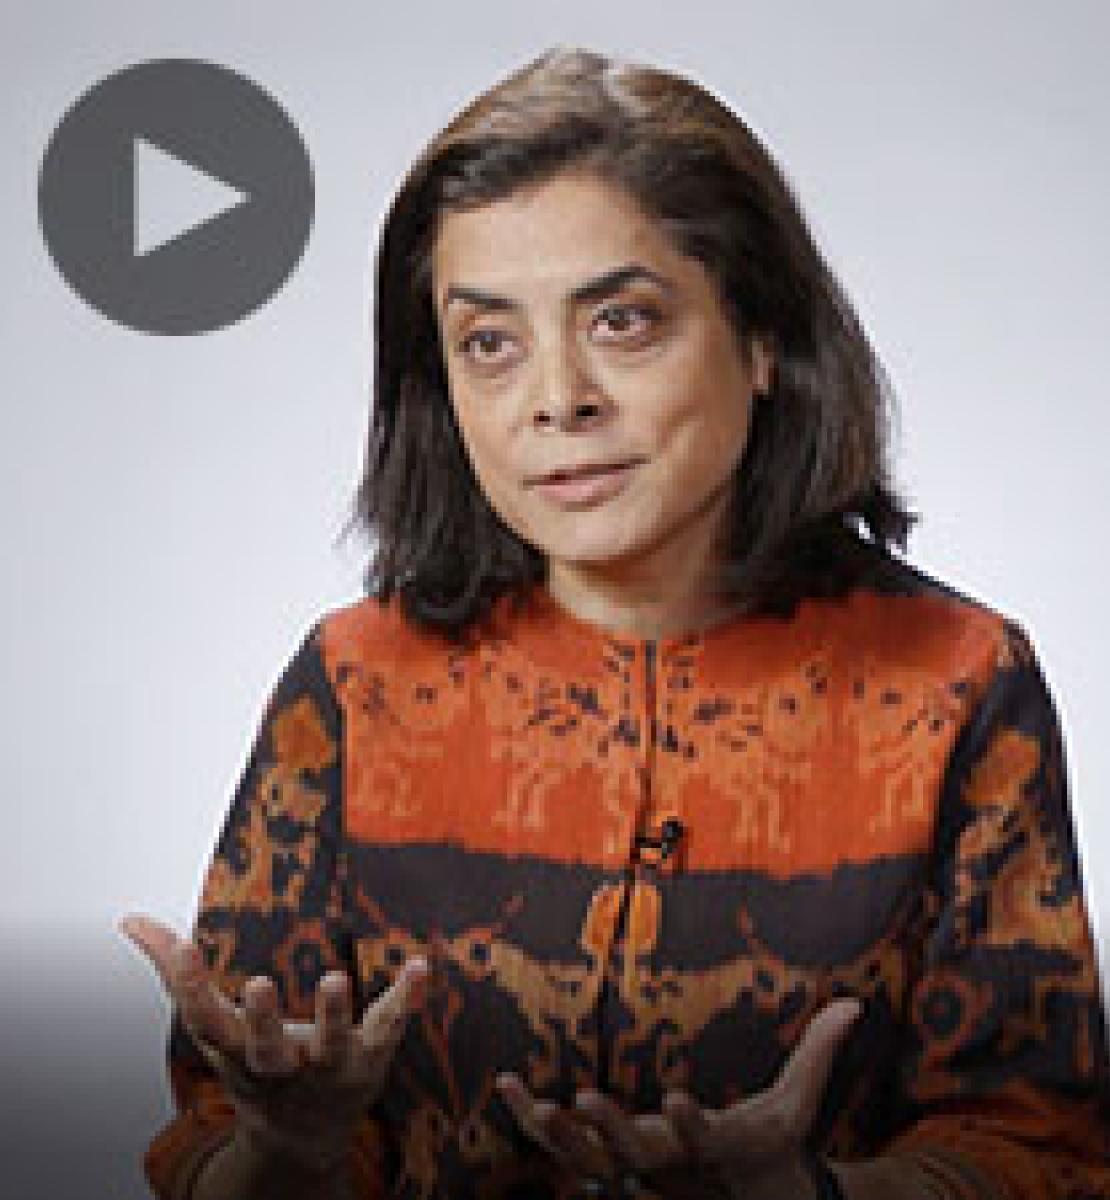 Screenshot from video message shows Resident Coordinator, Anita Nirody